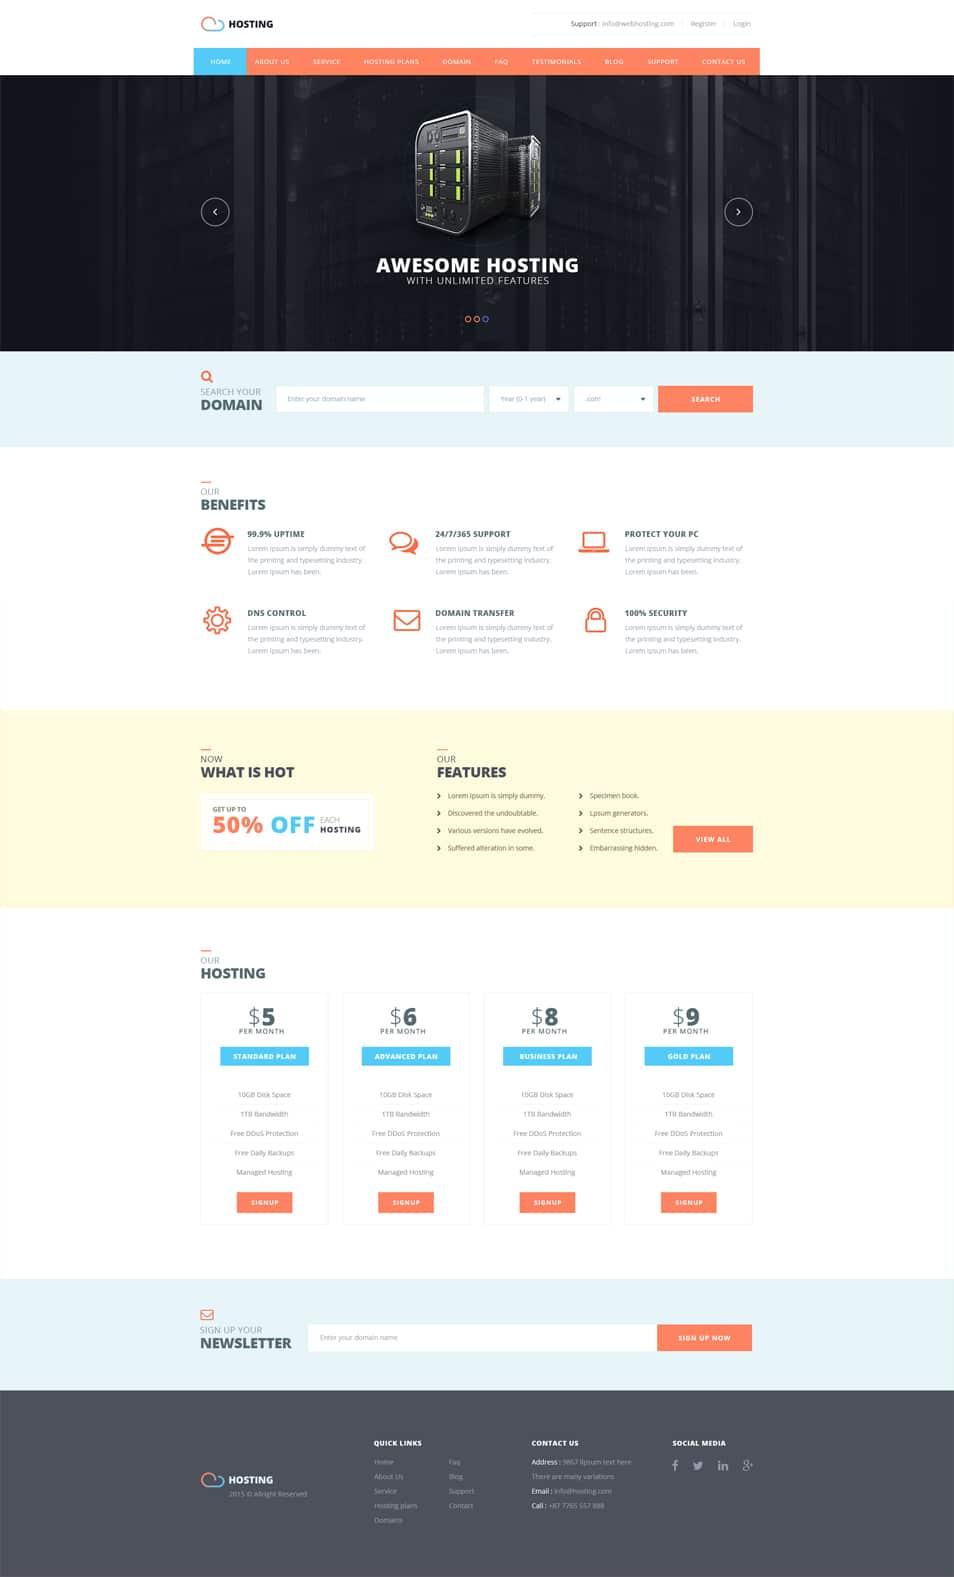 Free hosting web template psd designs css author for Css author